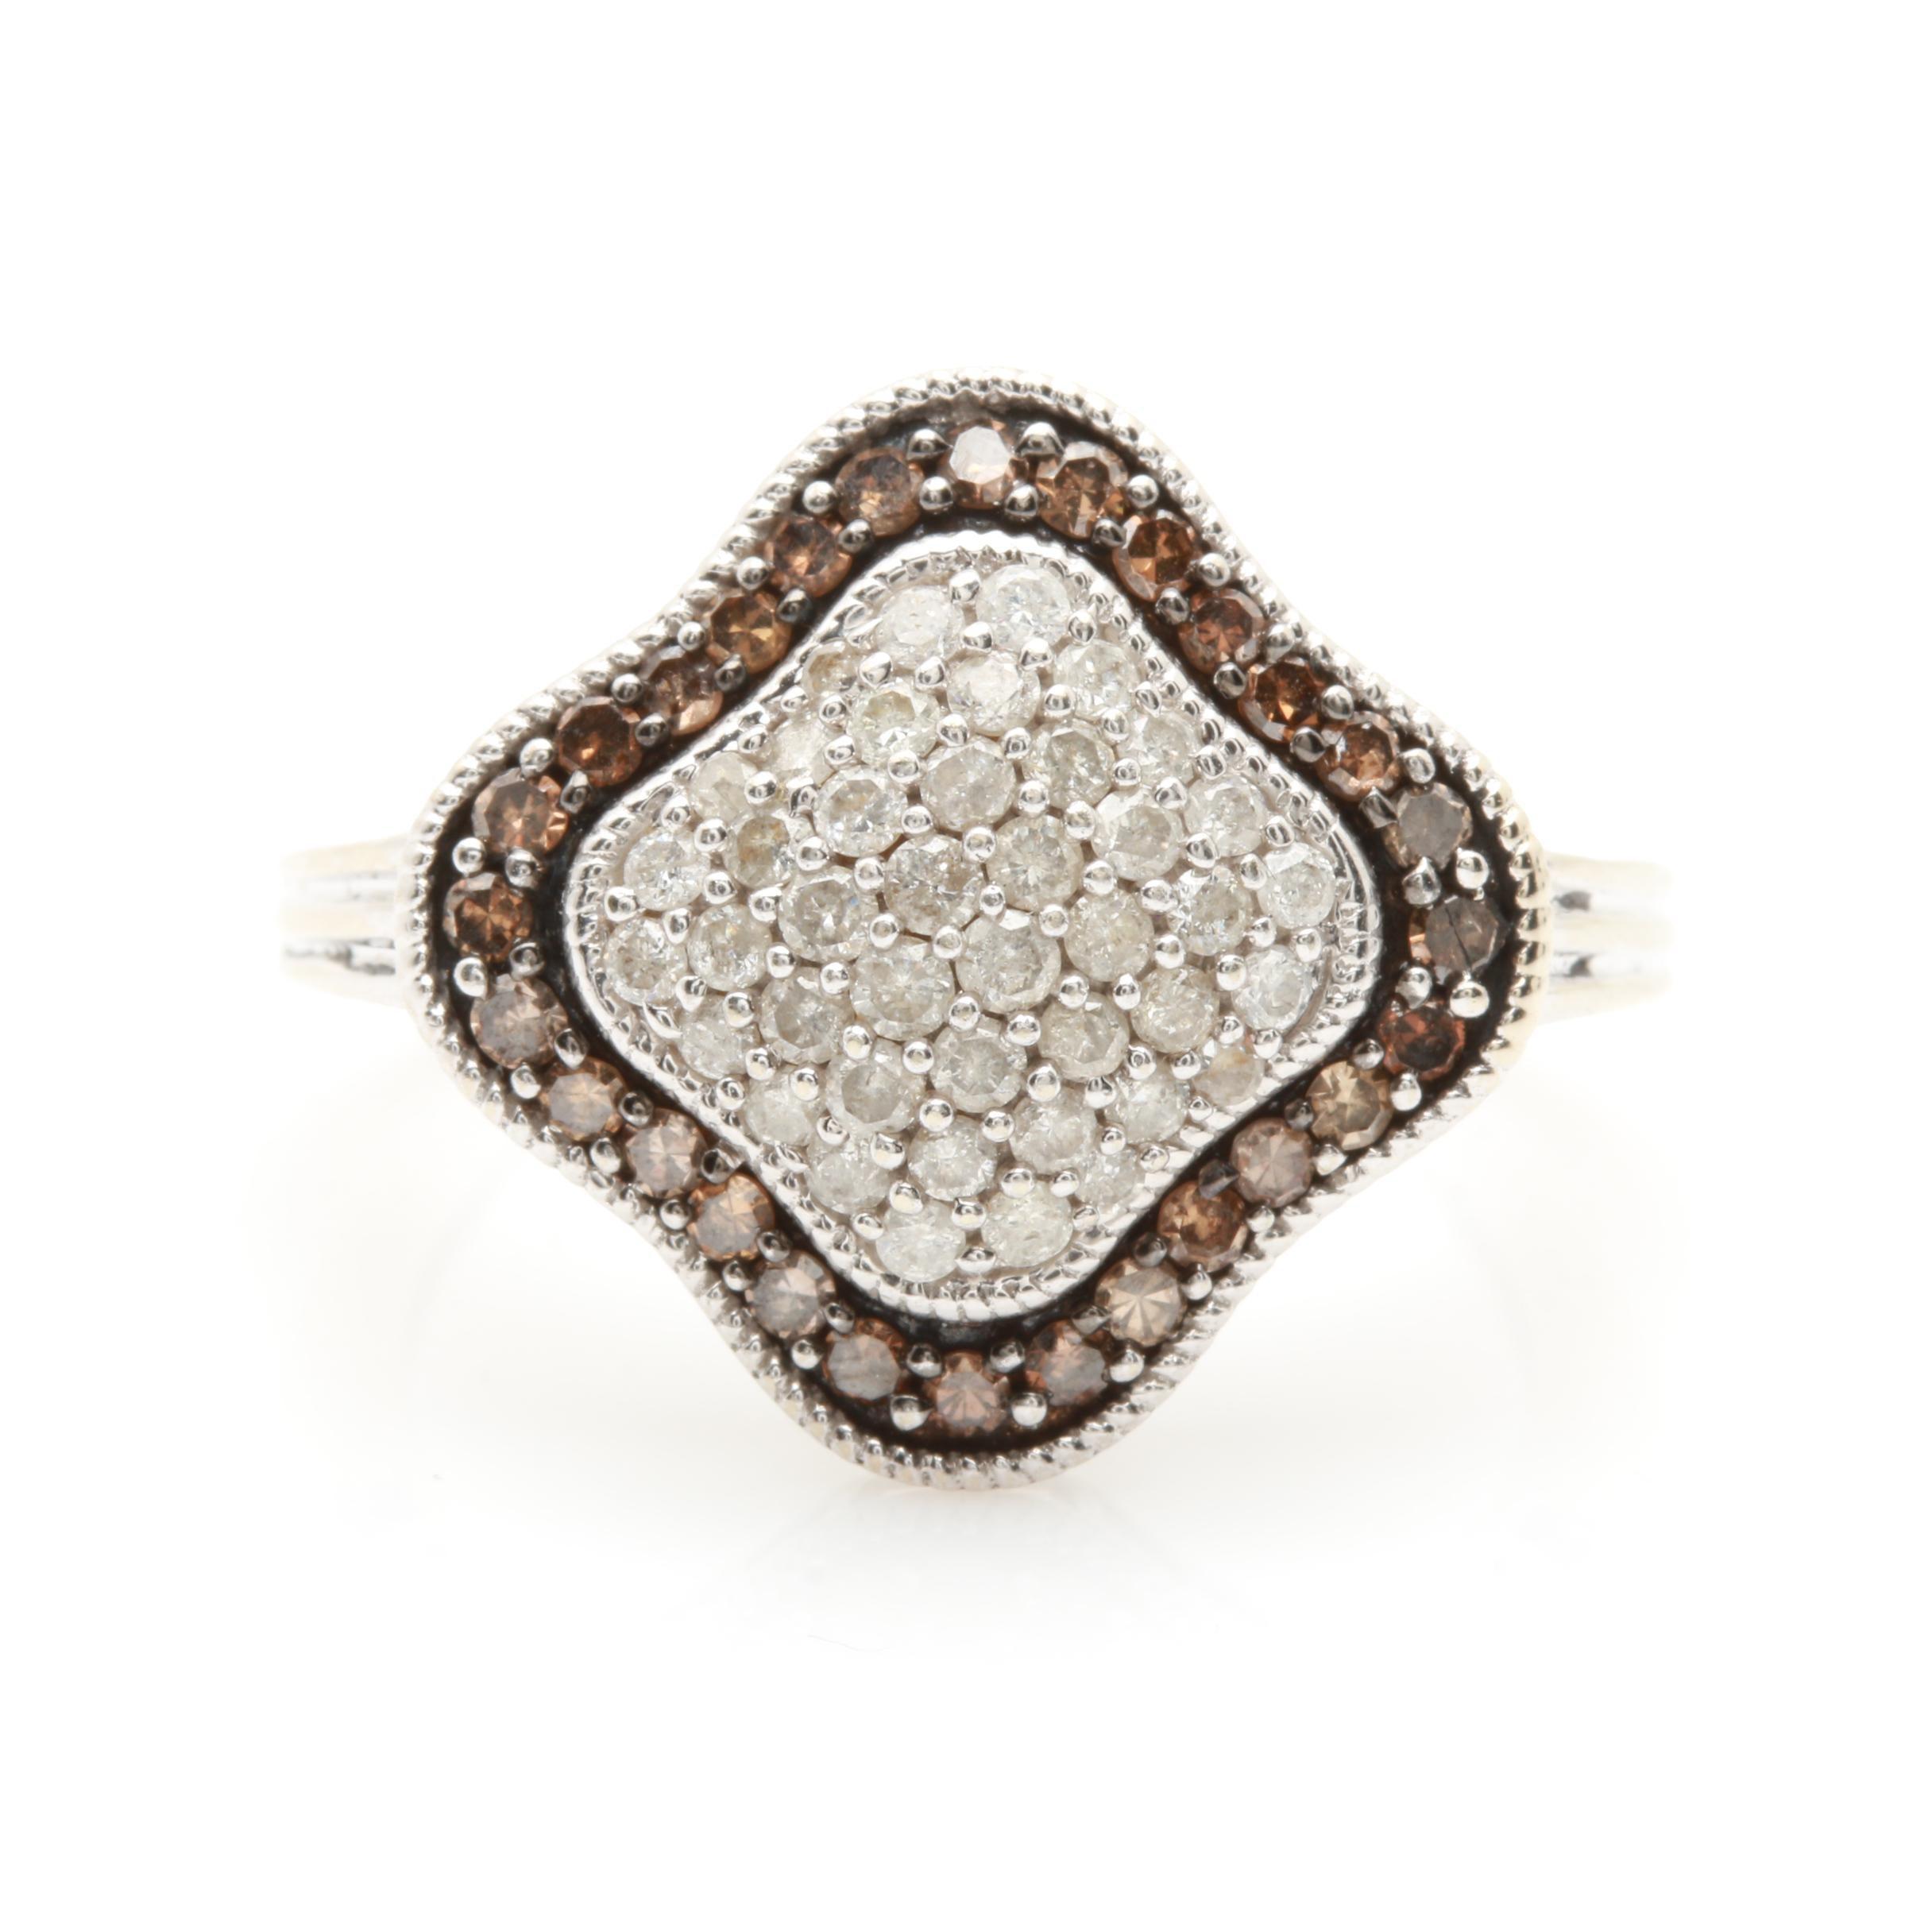 10K White Gold 1.05 CTW Diamond Ring Featuring Brown Diamonds